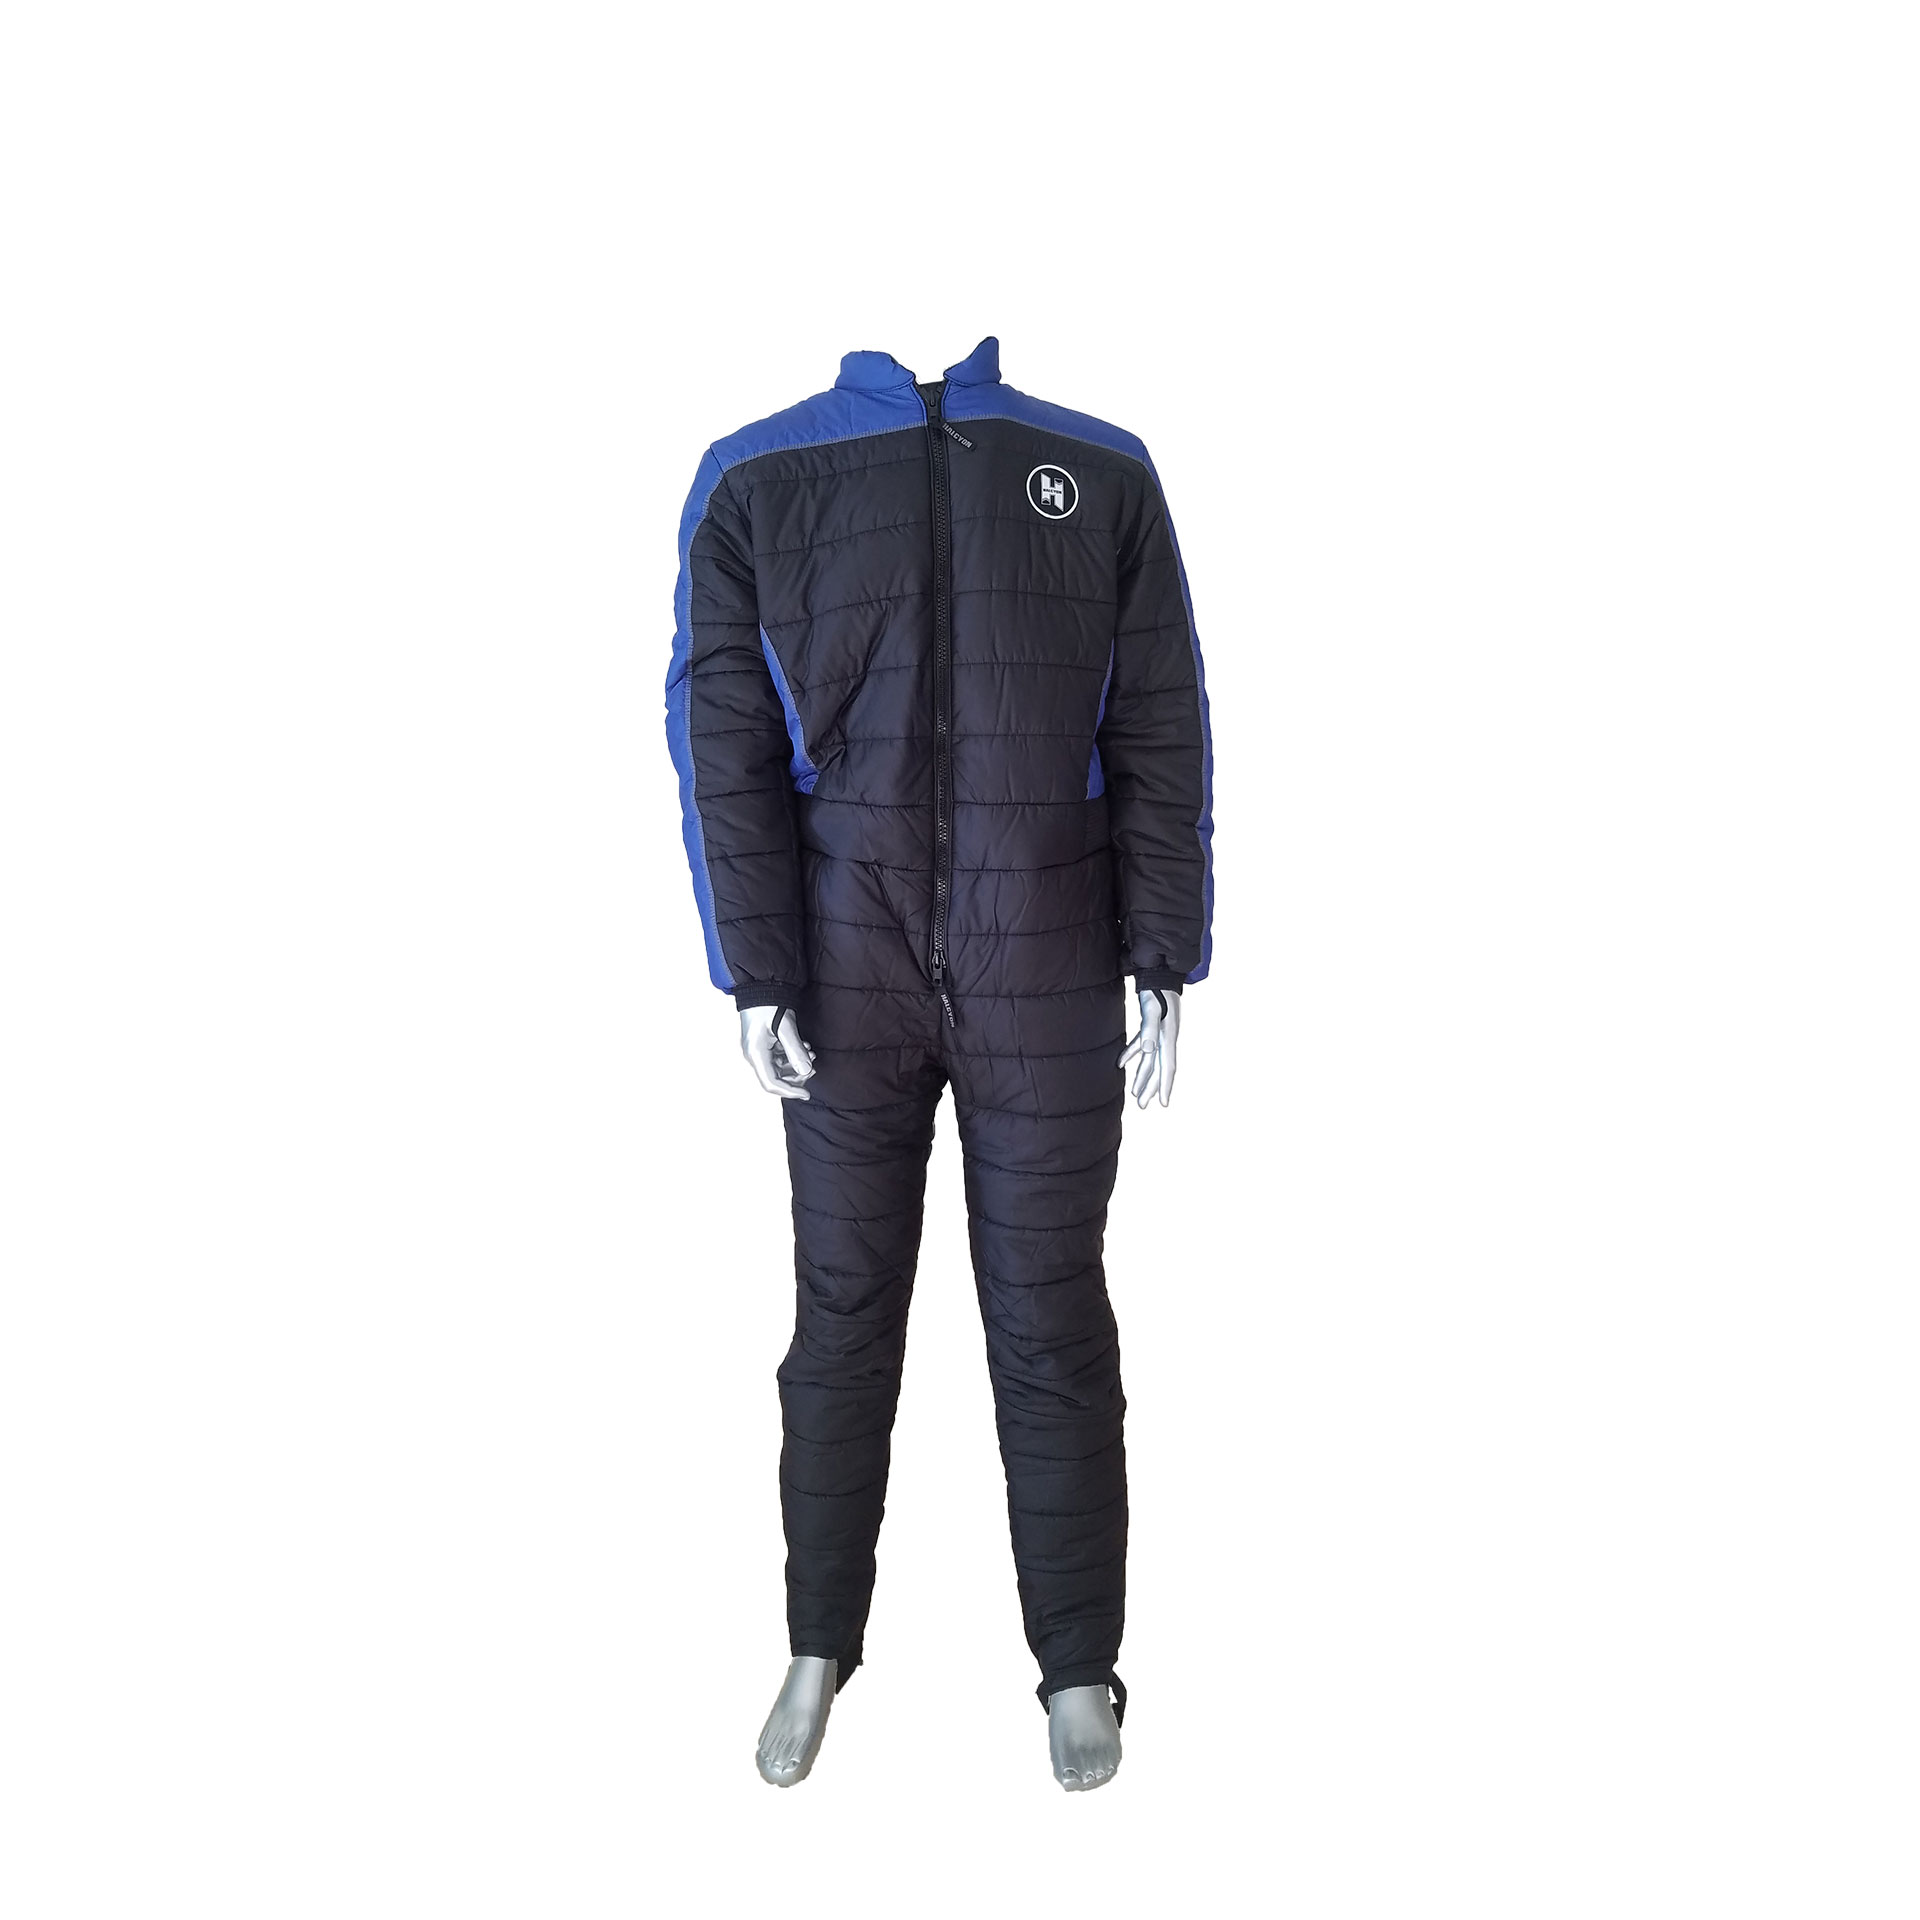 Primo Under Suit Men's